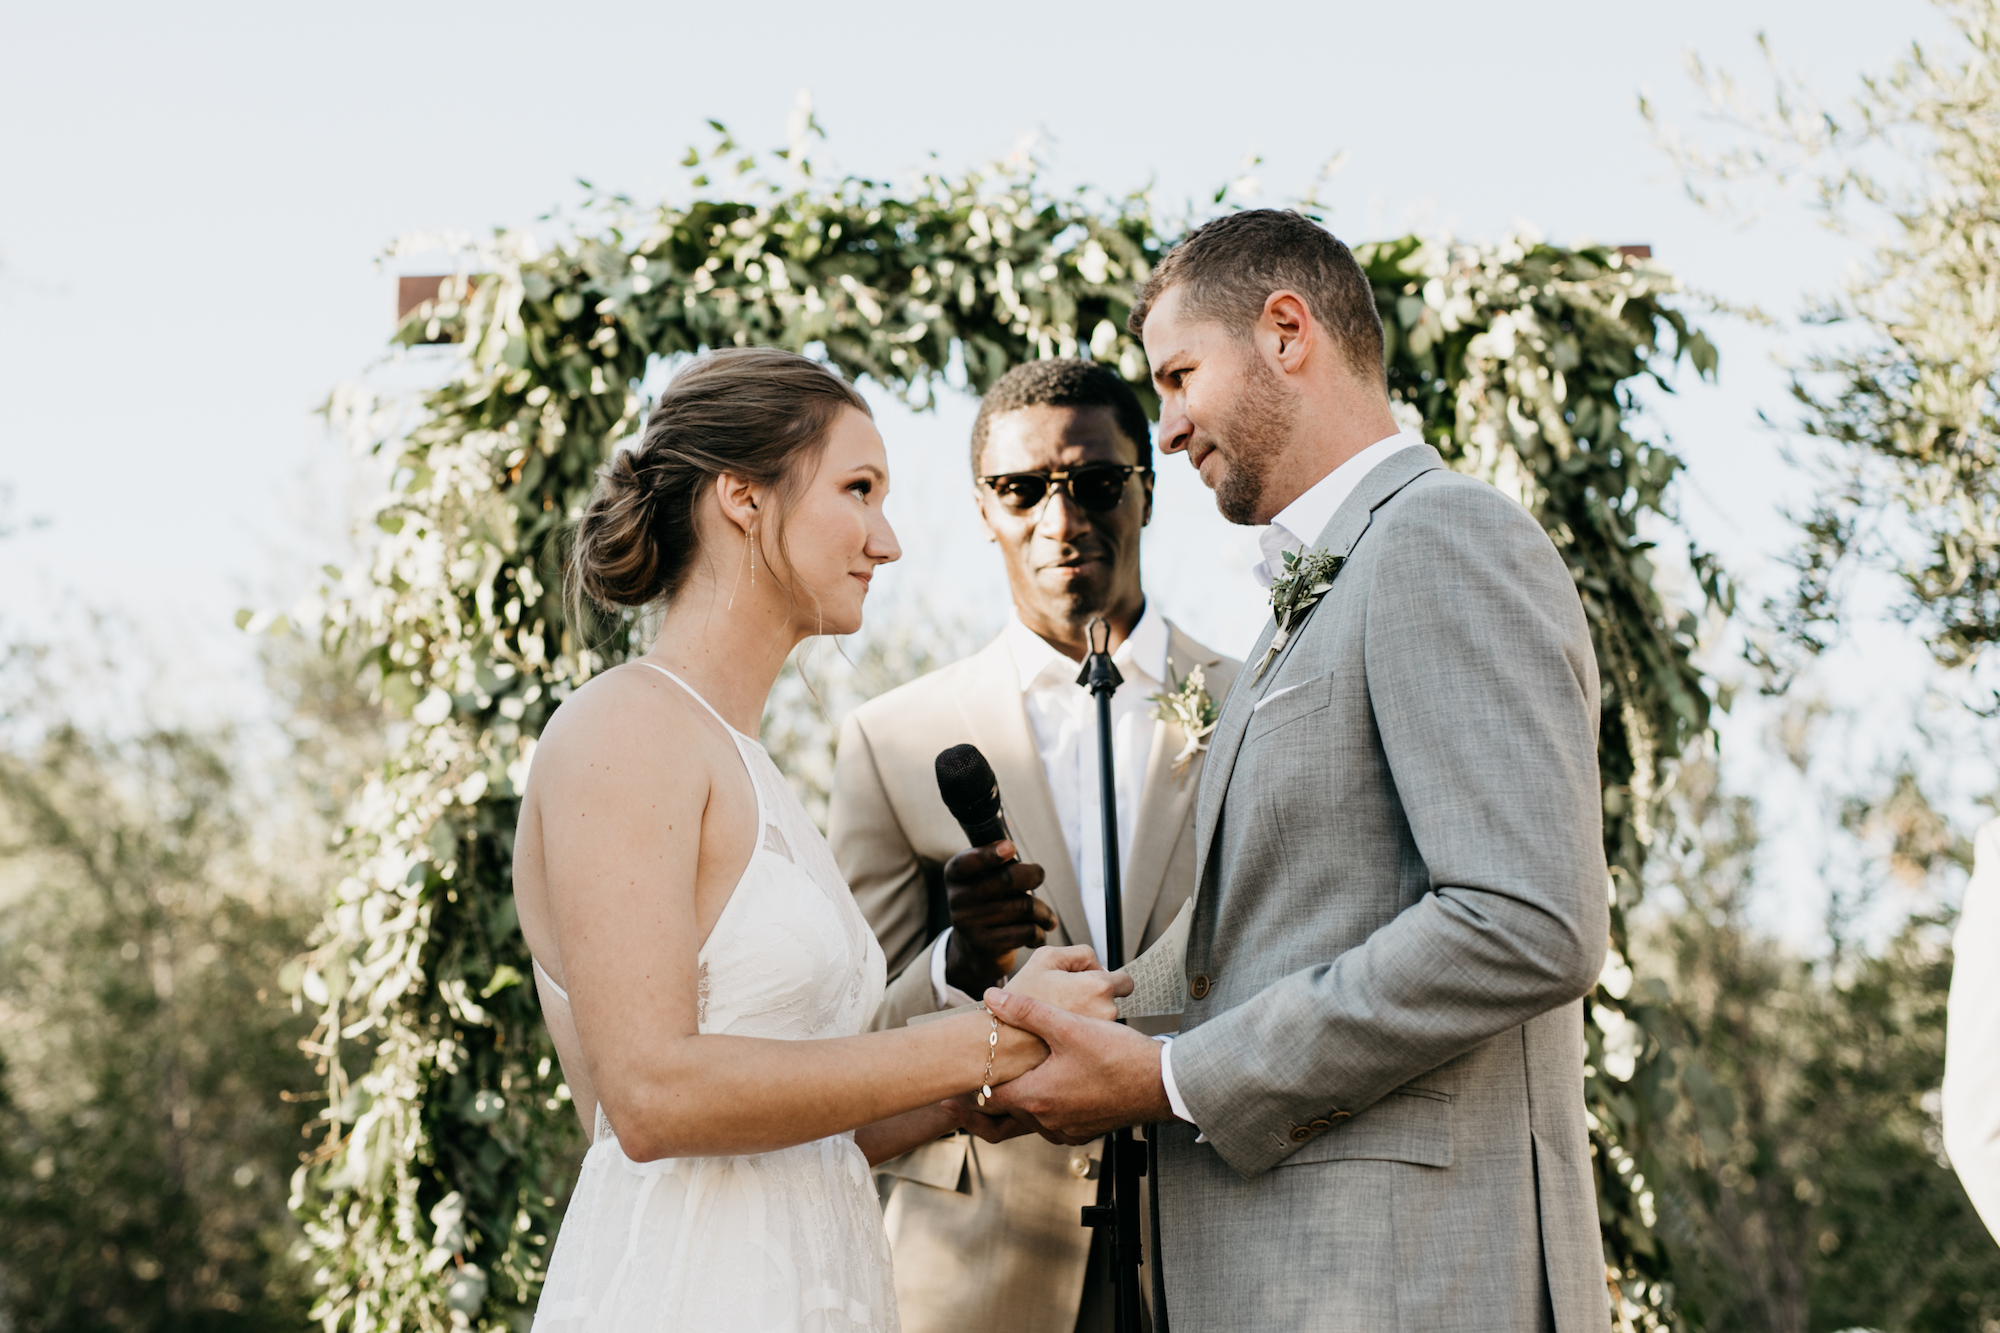 ace-hotel-palm-springs-wedding-photographer561.jpg